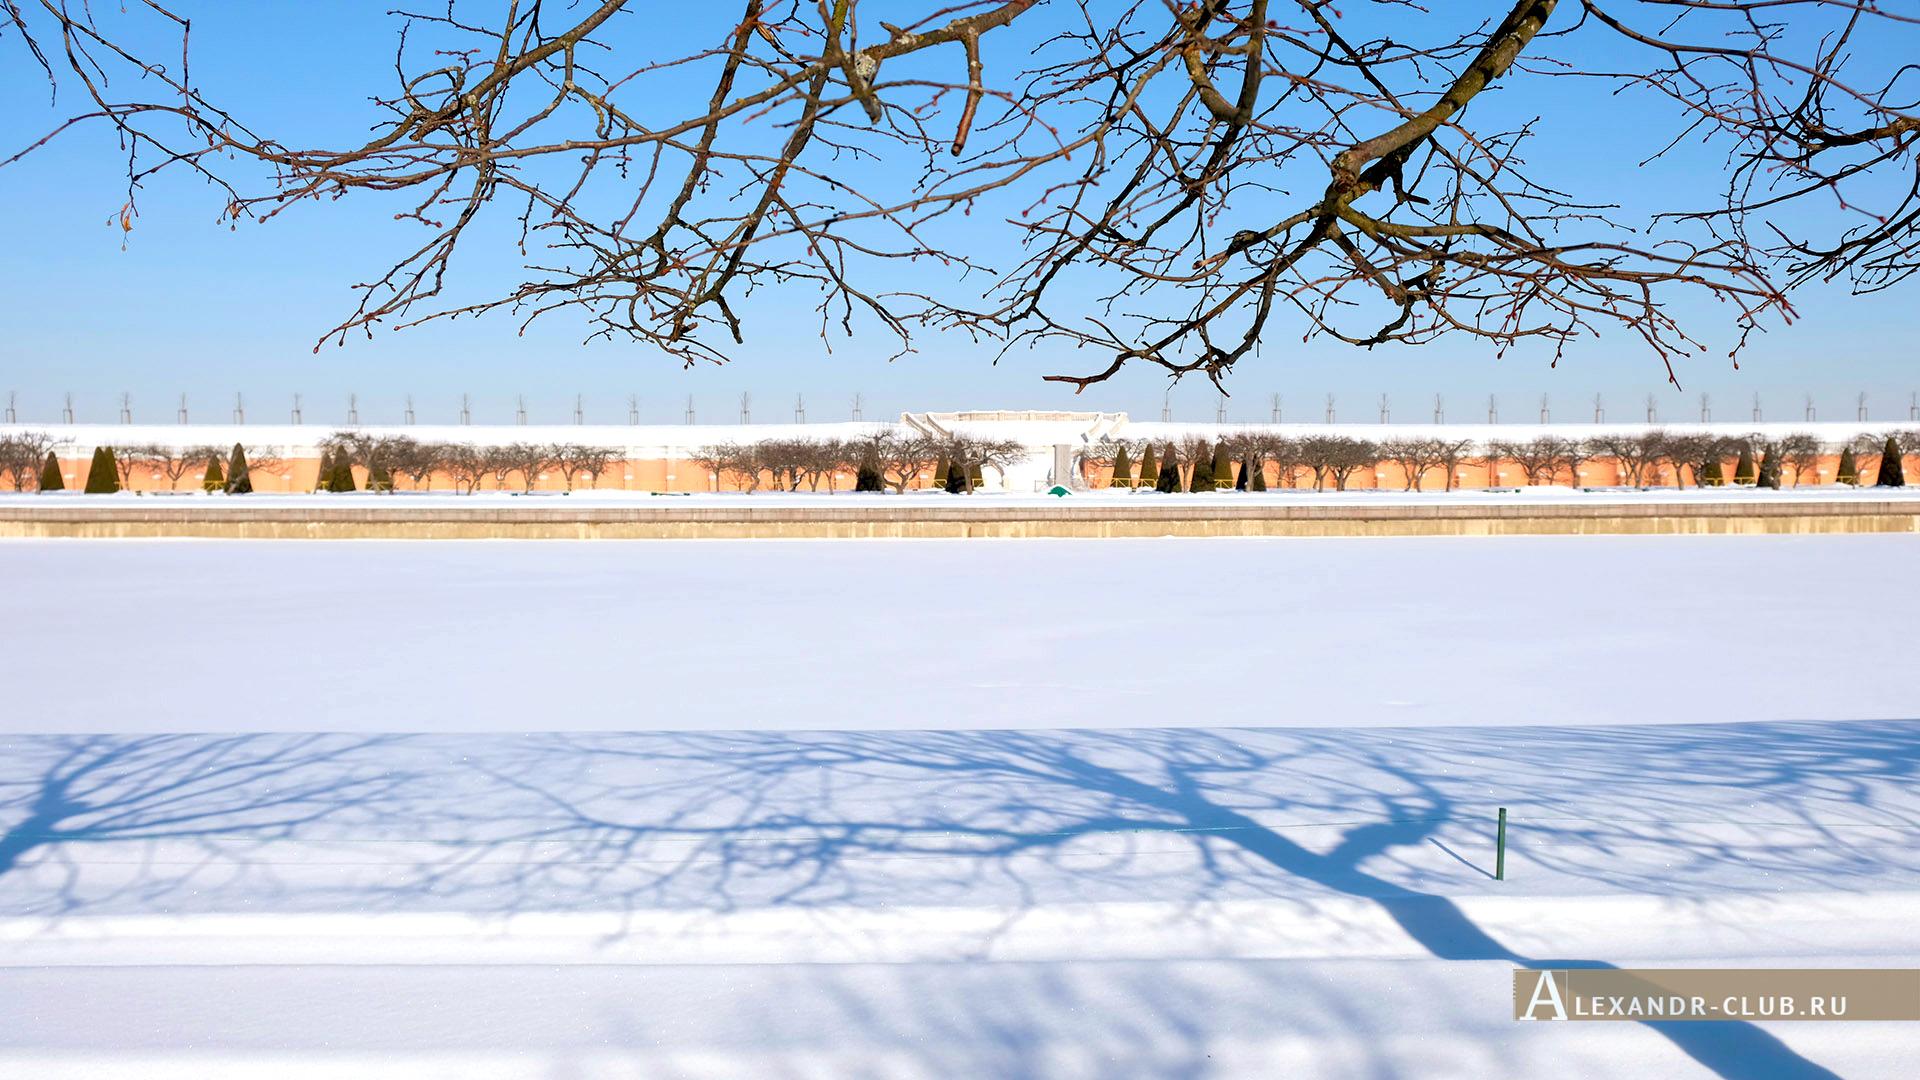 Петергоф, зима, Нижний парк, Марлинский пруд и Марлинский вал – 1